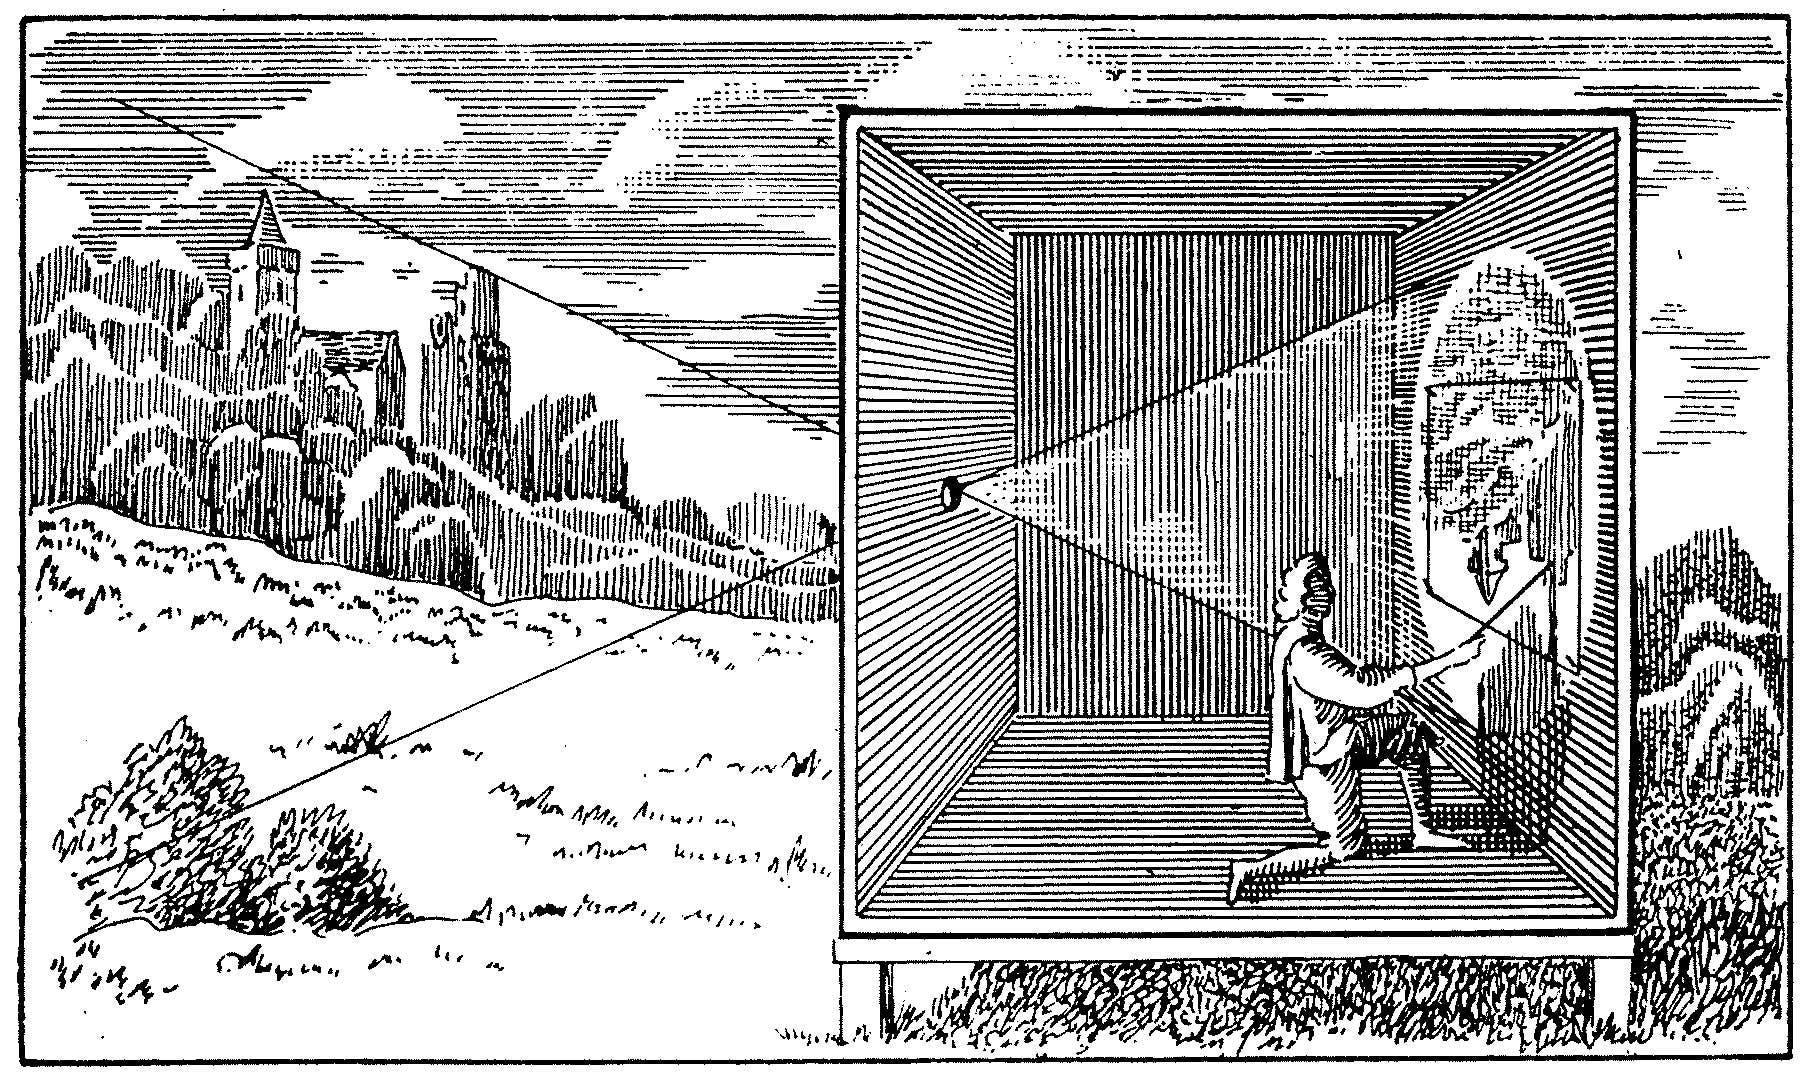 Illustration of an old camera room